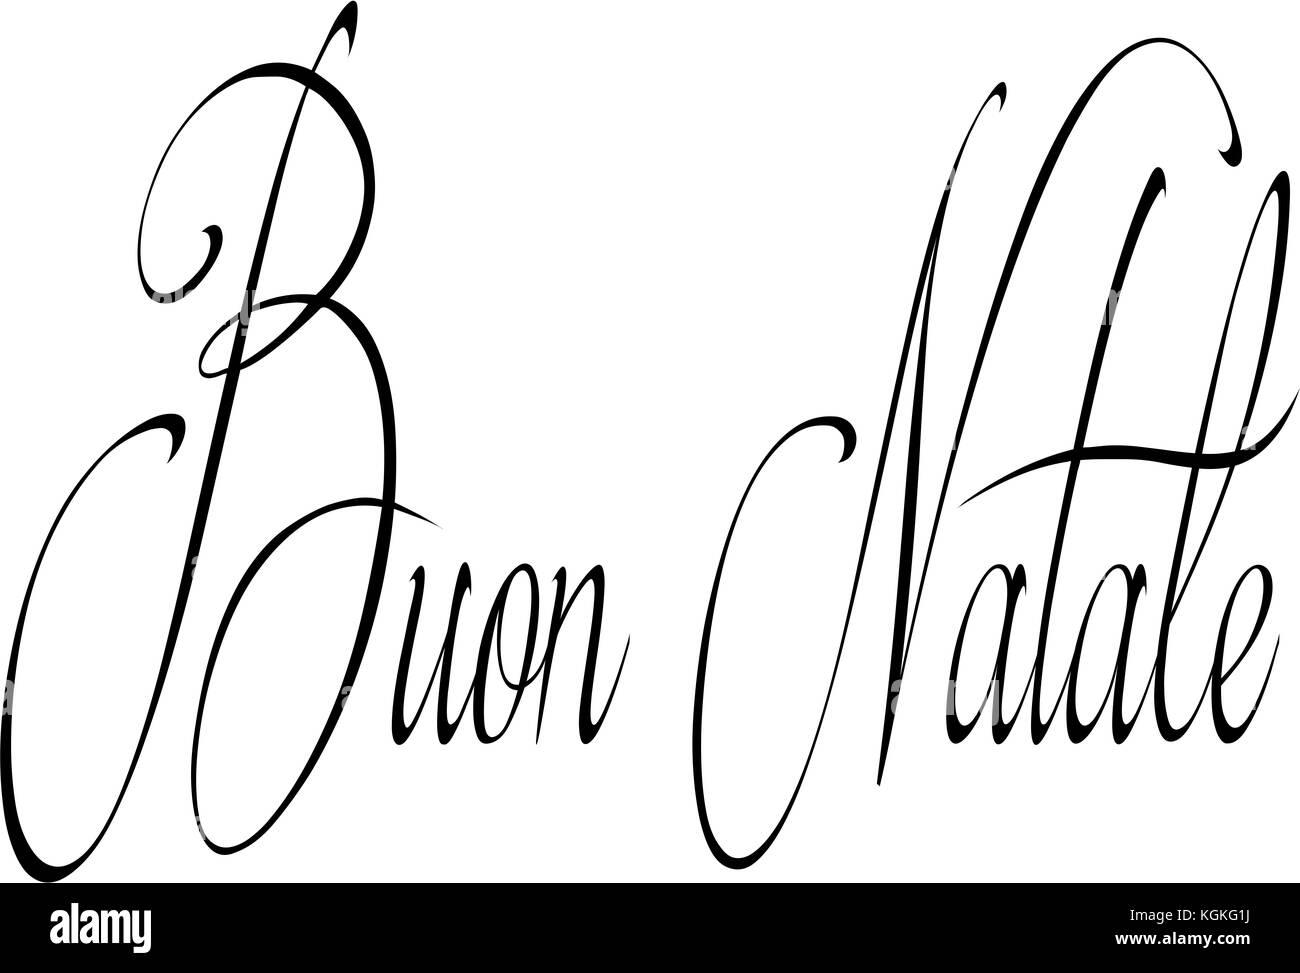 Merry Christmas writen in Italian written on a white Background - Stock Image